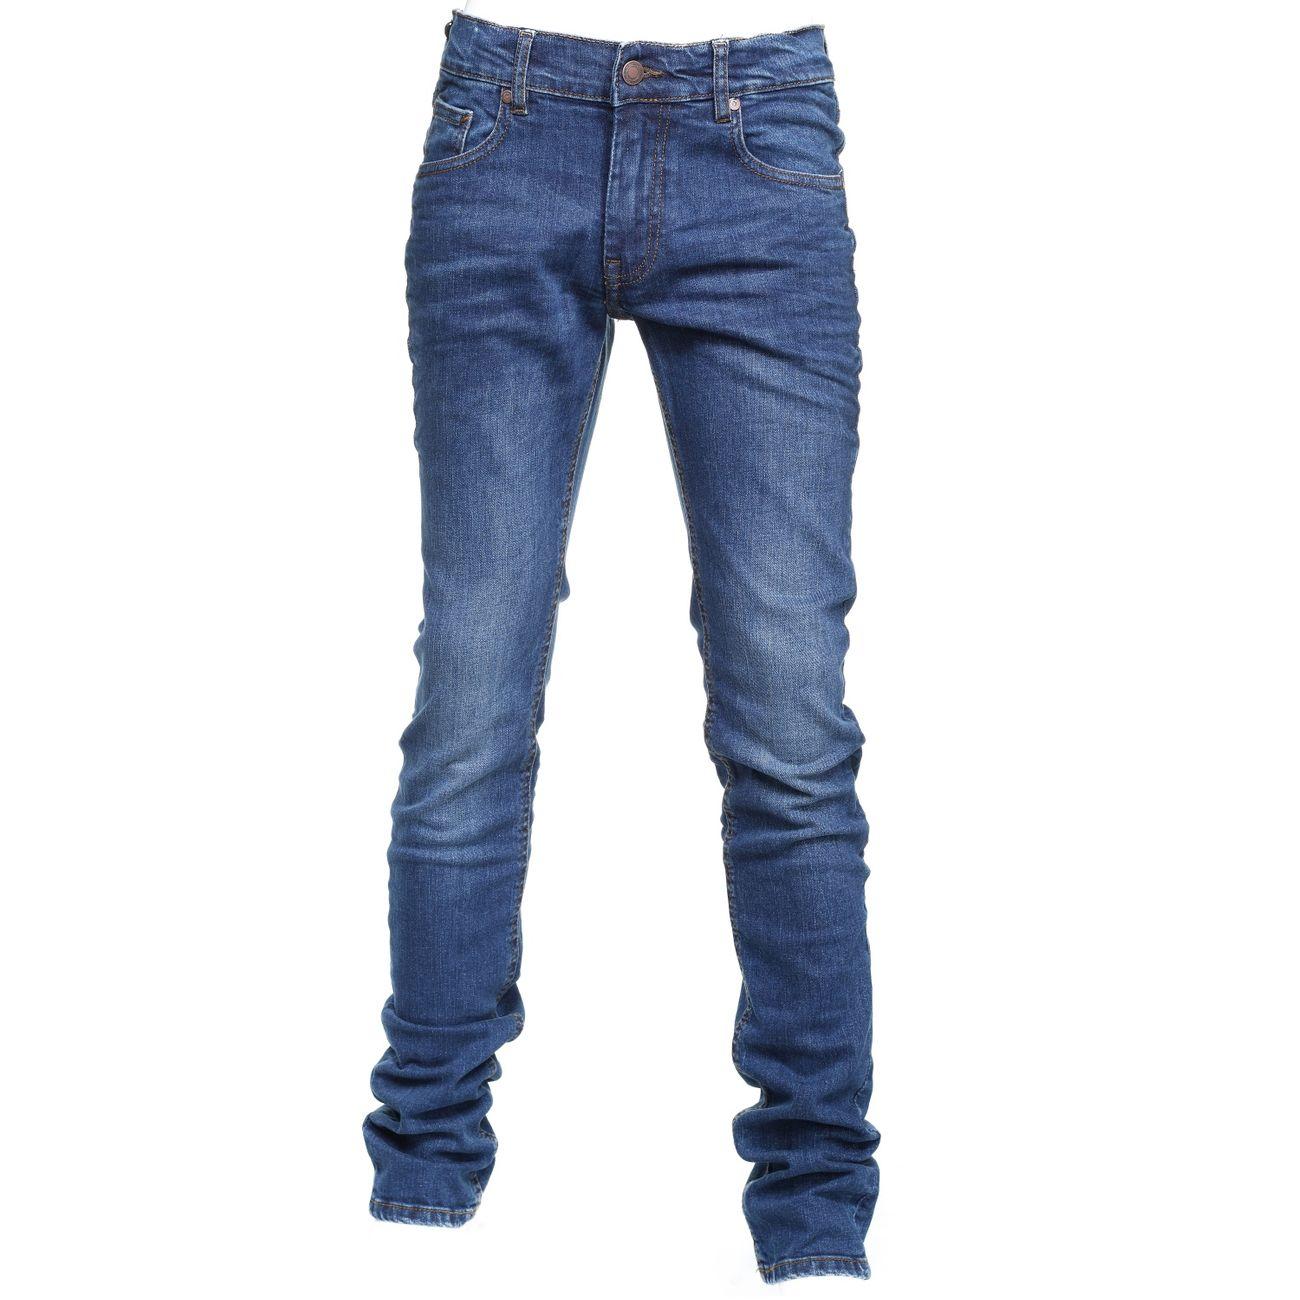 Mode- Lifestyle garçon TEDDY SMITH Jeans garà§on Teddy Smith Reming Jr 60105316d 307 Vintage/indigo